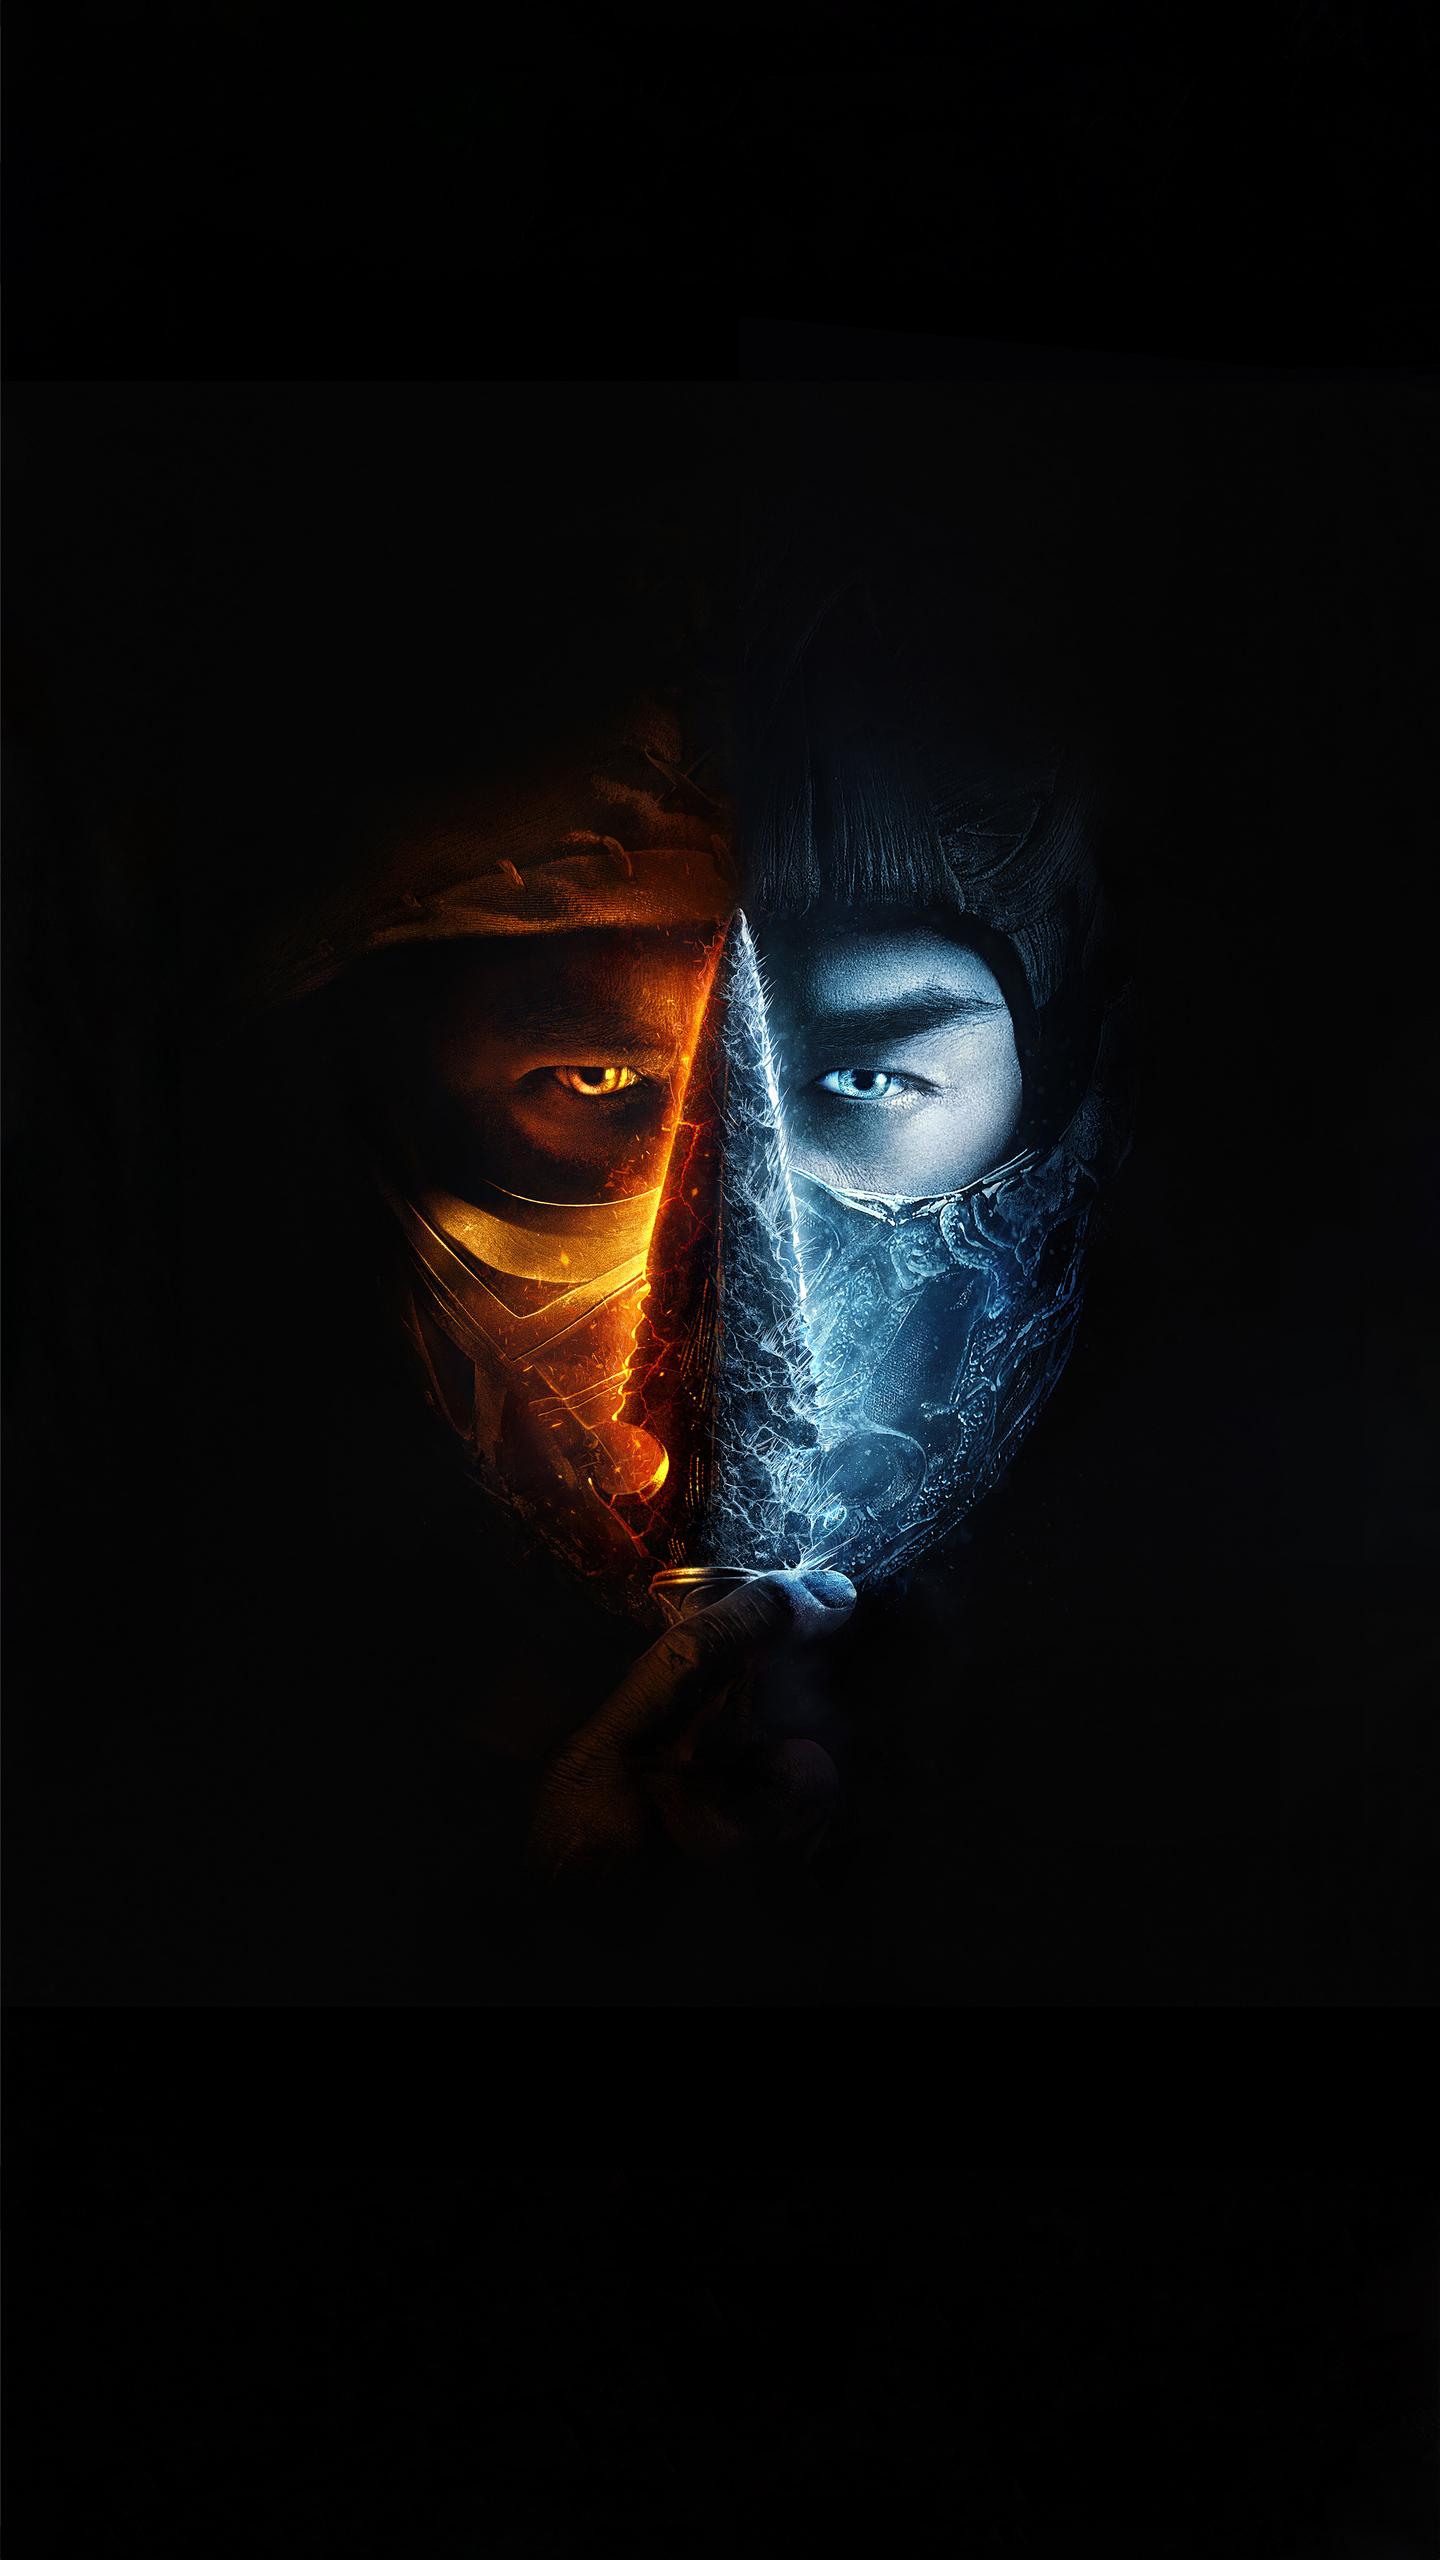 mortal-kombat-movie-logo-4k-xq.jpg